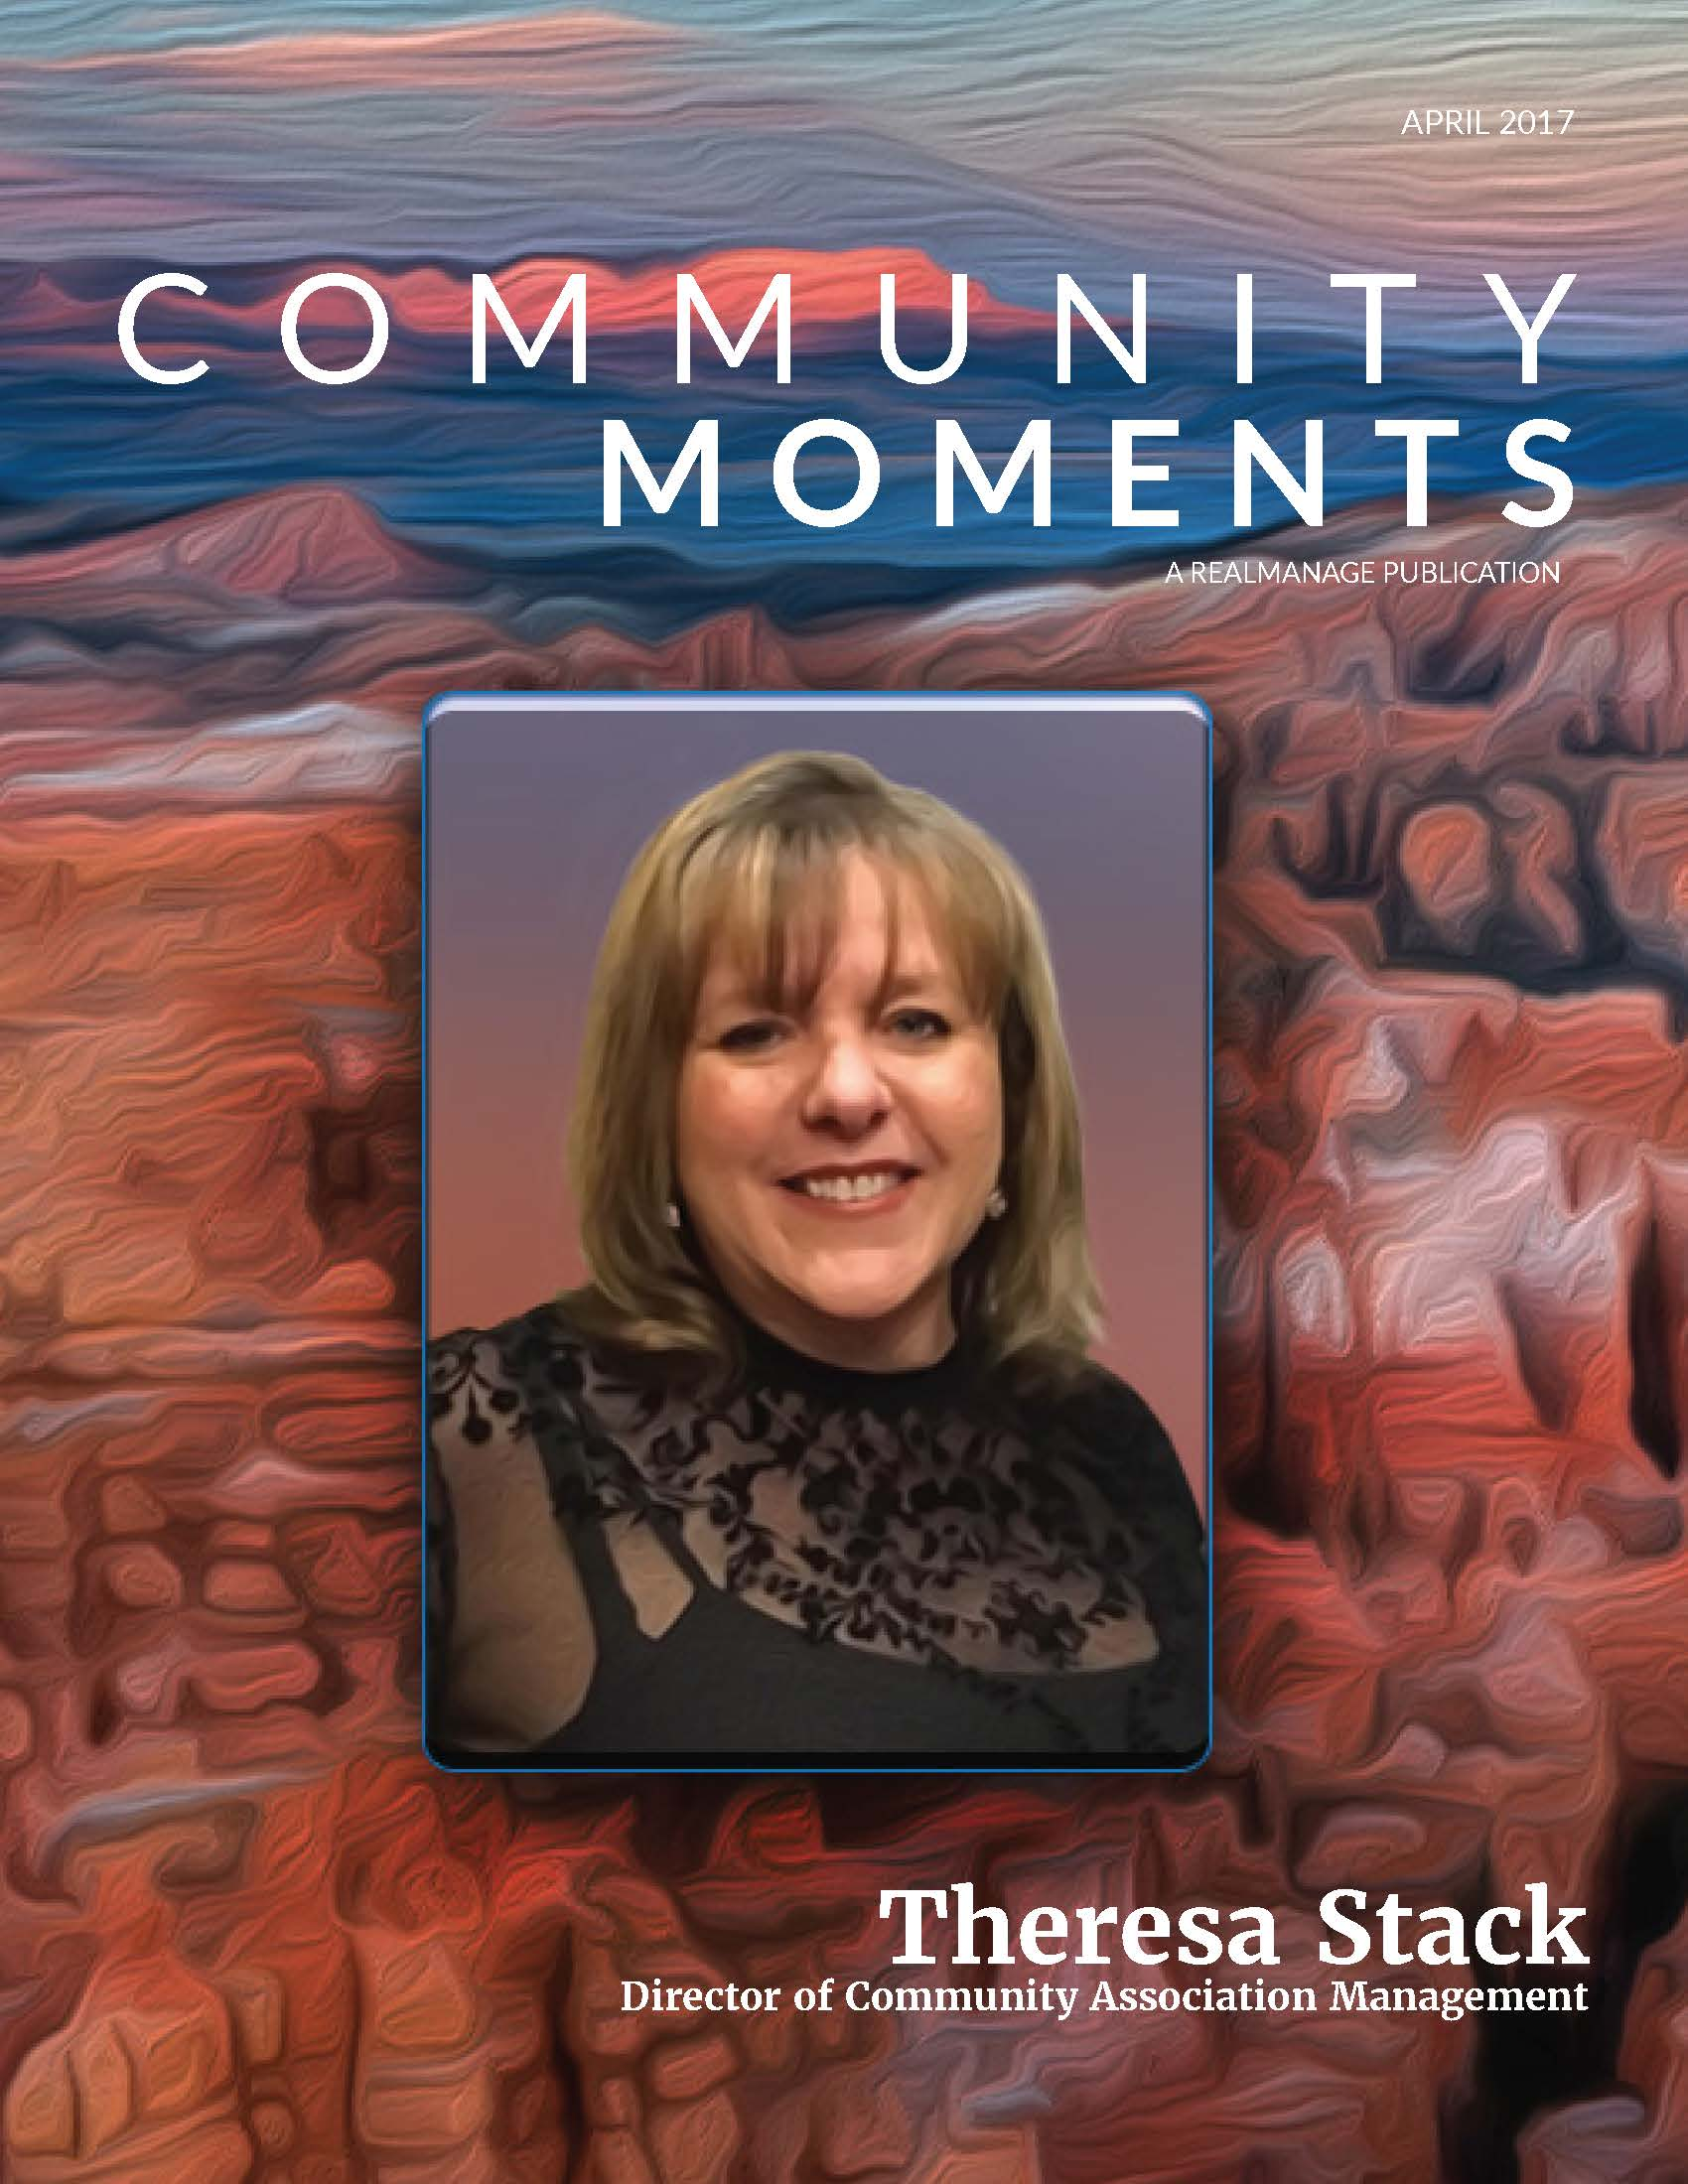 April 2017 RealManage Community Moments Magazine